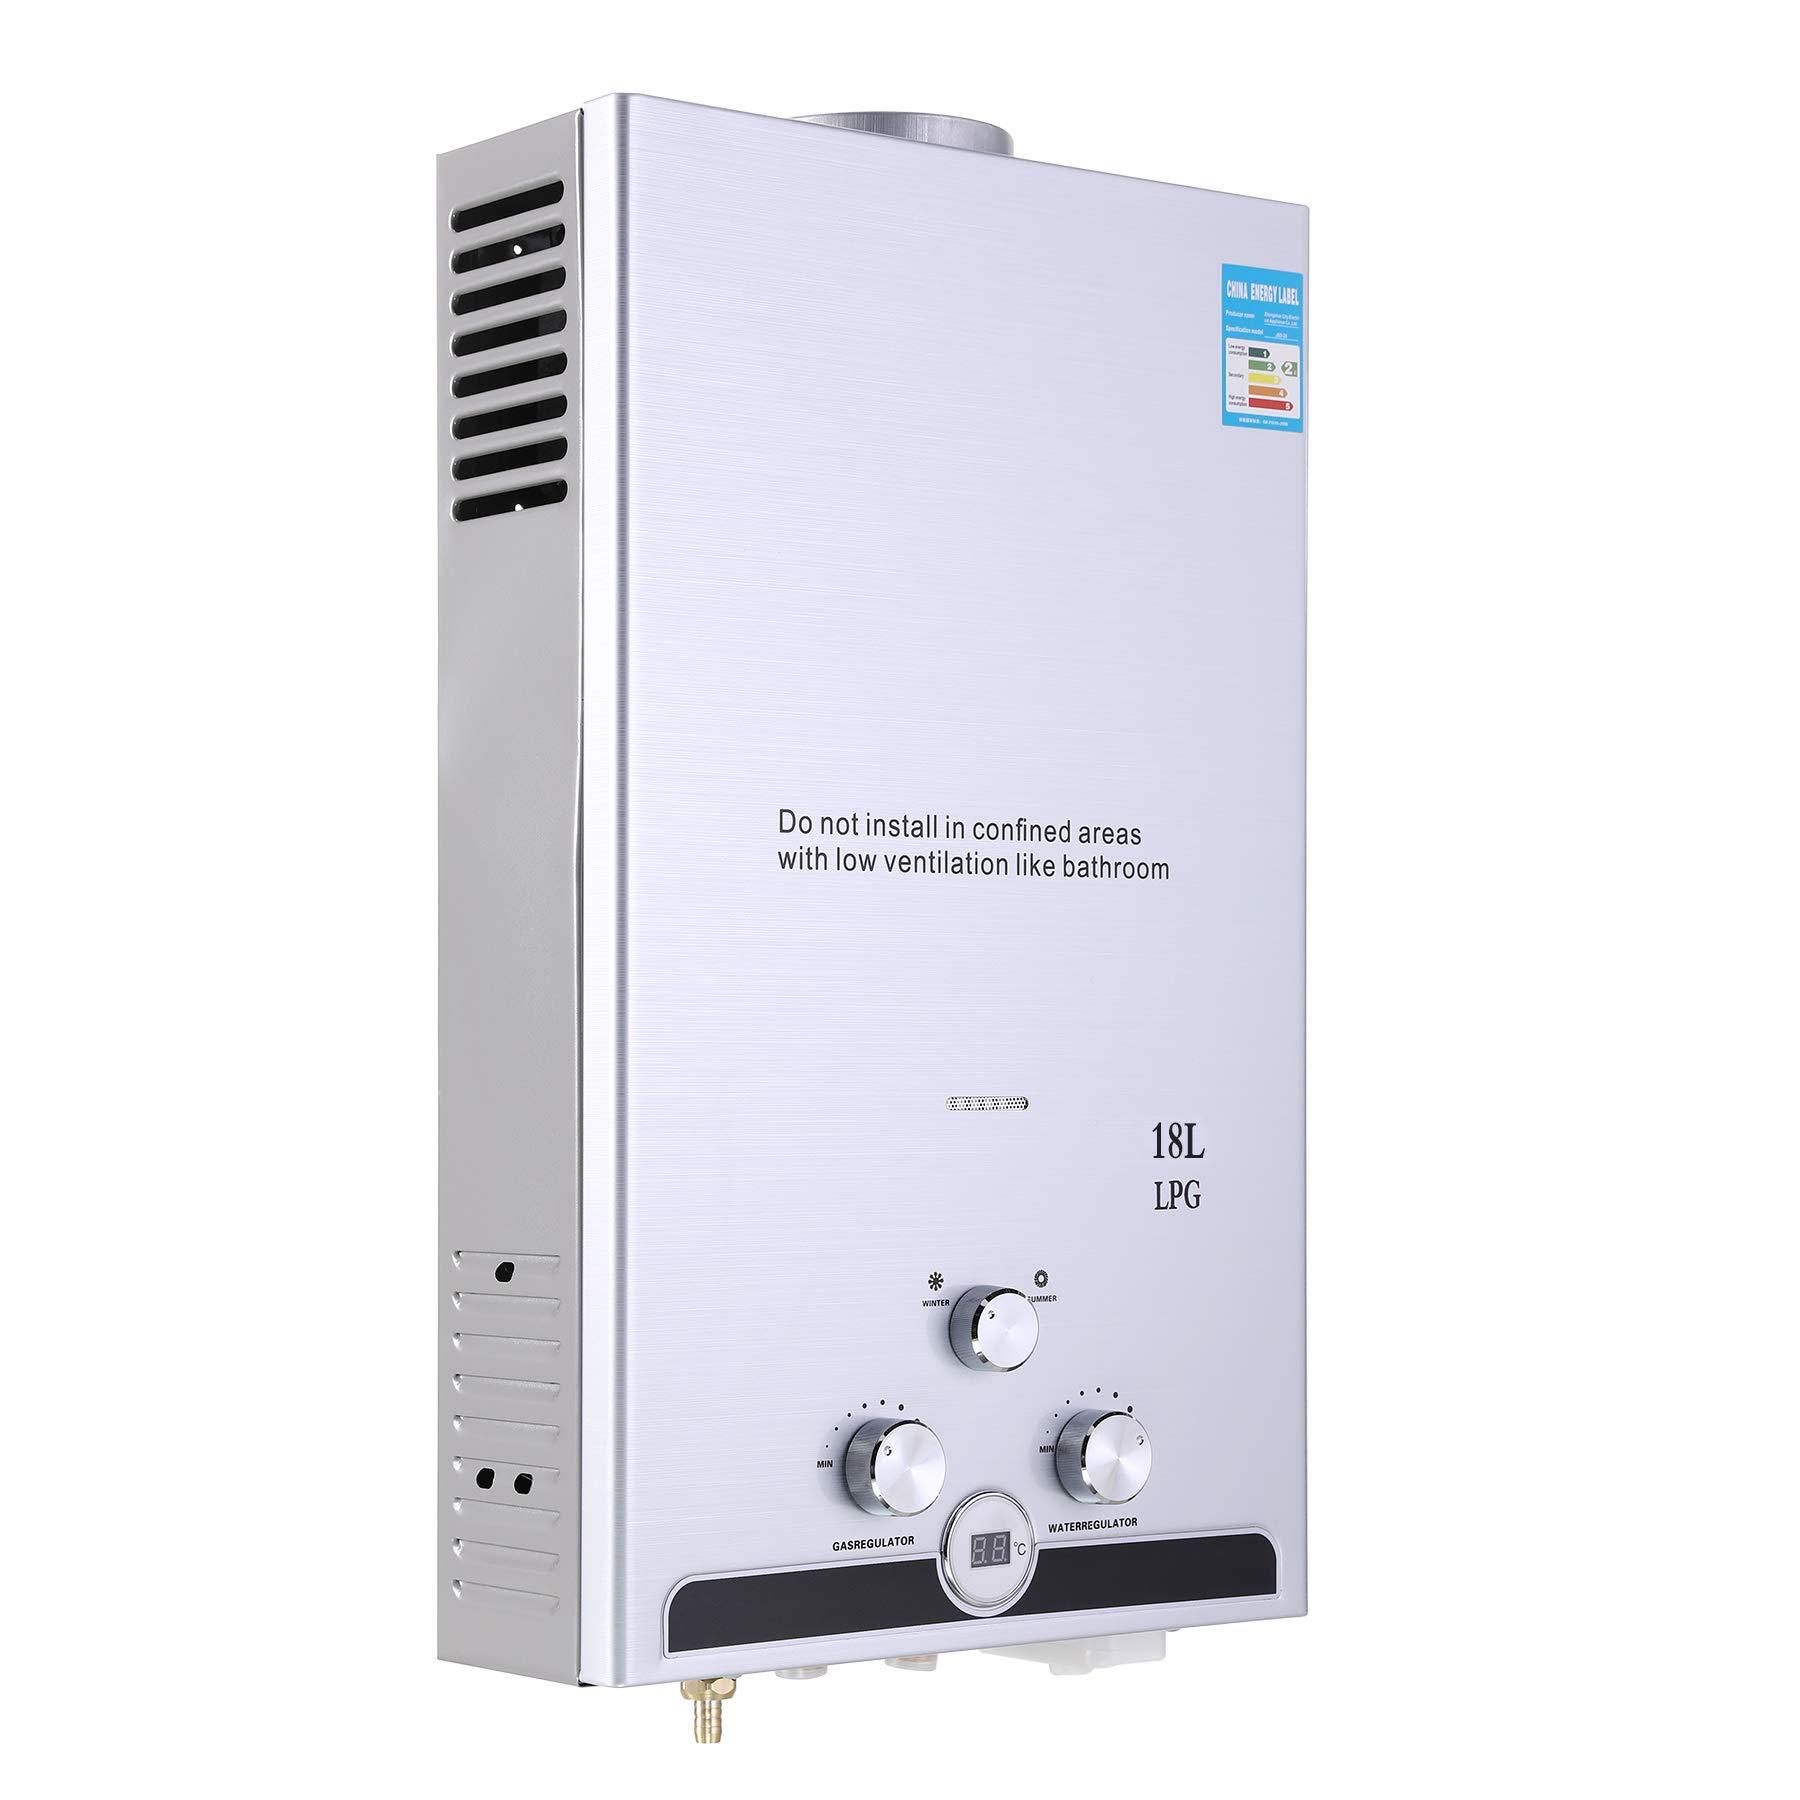 Digital Display LPG 8L Natural Gas Tankless Instant Hot Water Heater Boiler